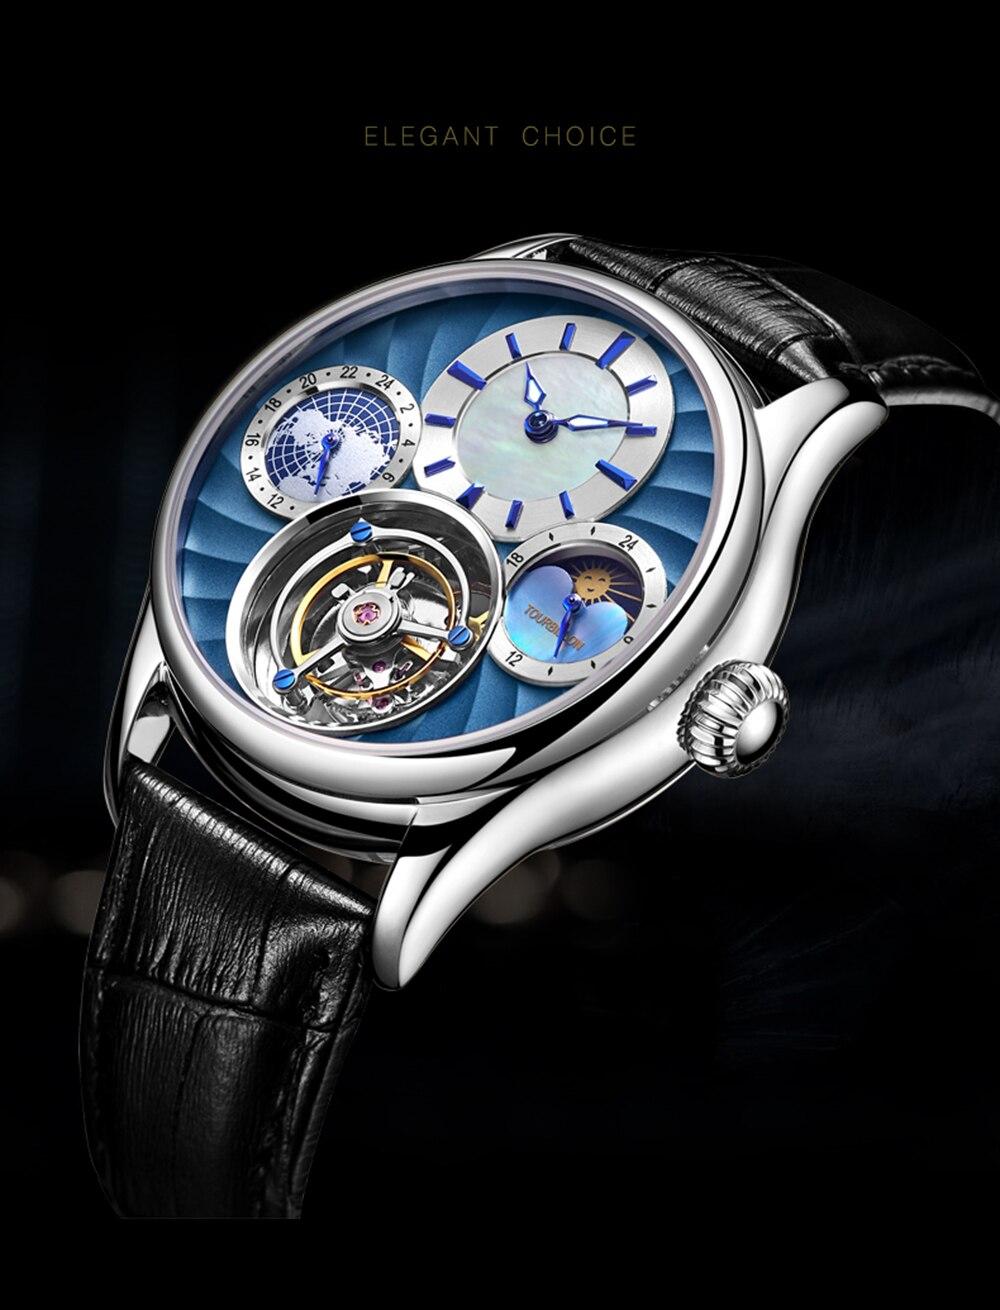 Original Tourbillon watch GUANQIN 2019 NEW clock men waterproof mechanical Sapphire leather top brand luxury Relogio Masculino 2